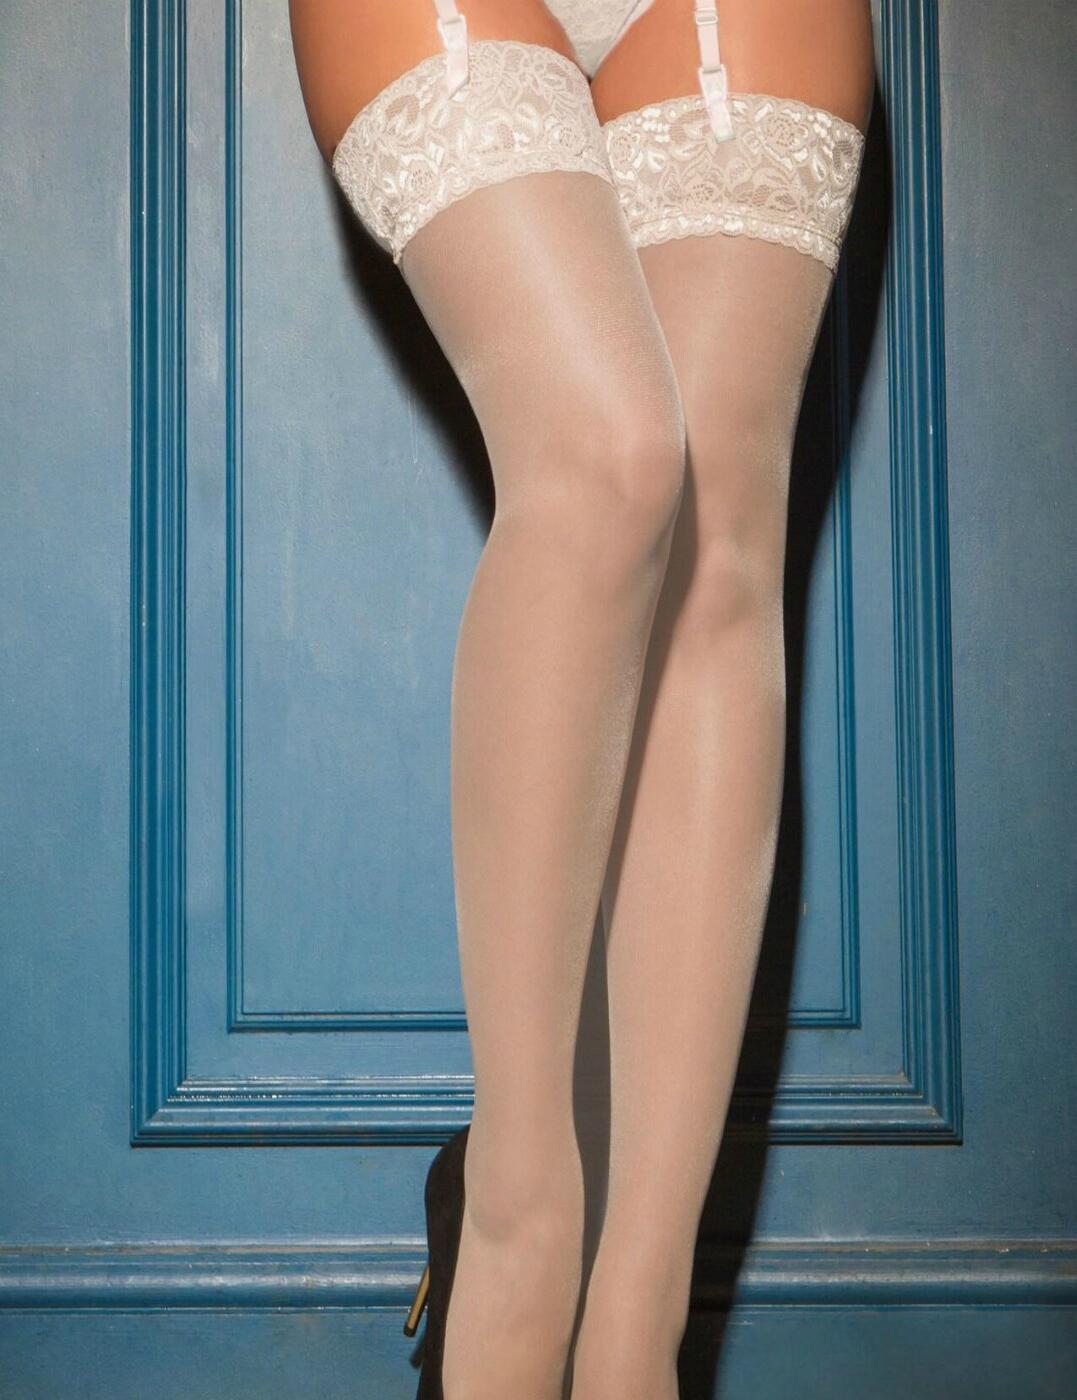 252 Pour Moi Allure Lace Top 15 Denier Stockings - 252 Ivory